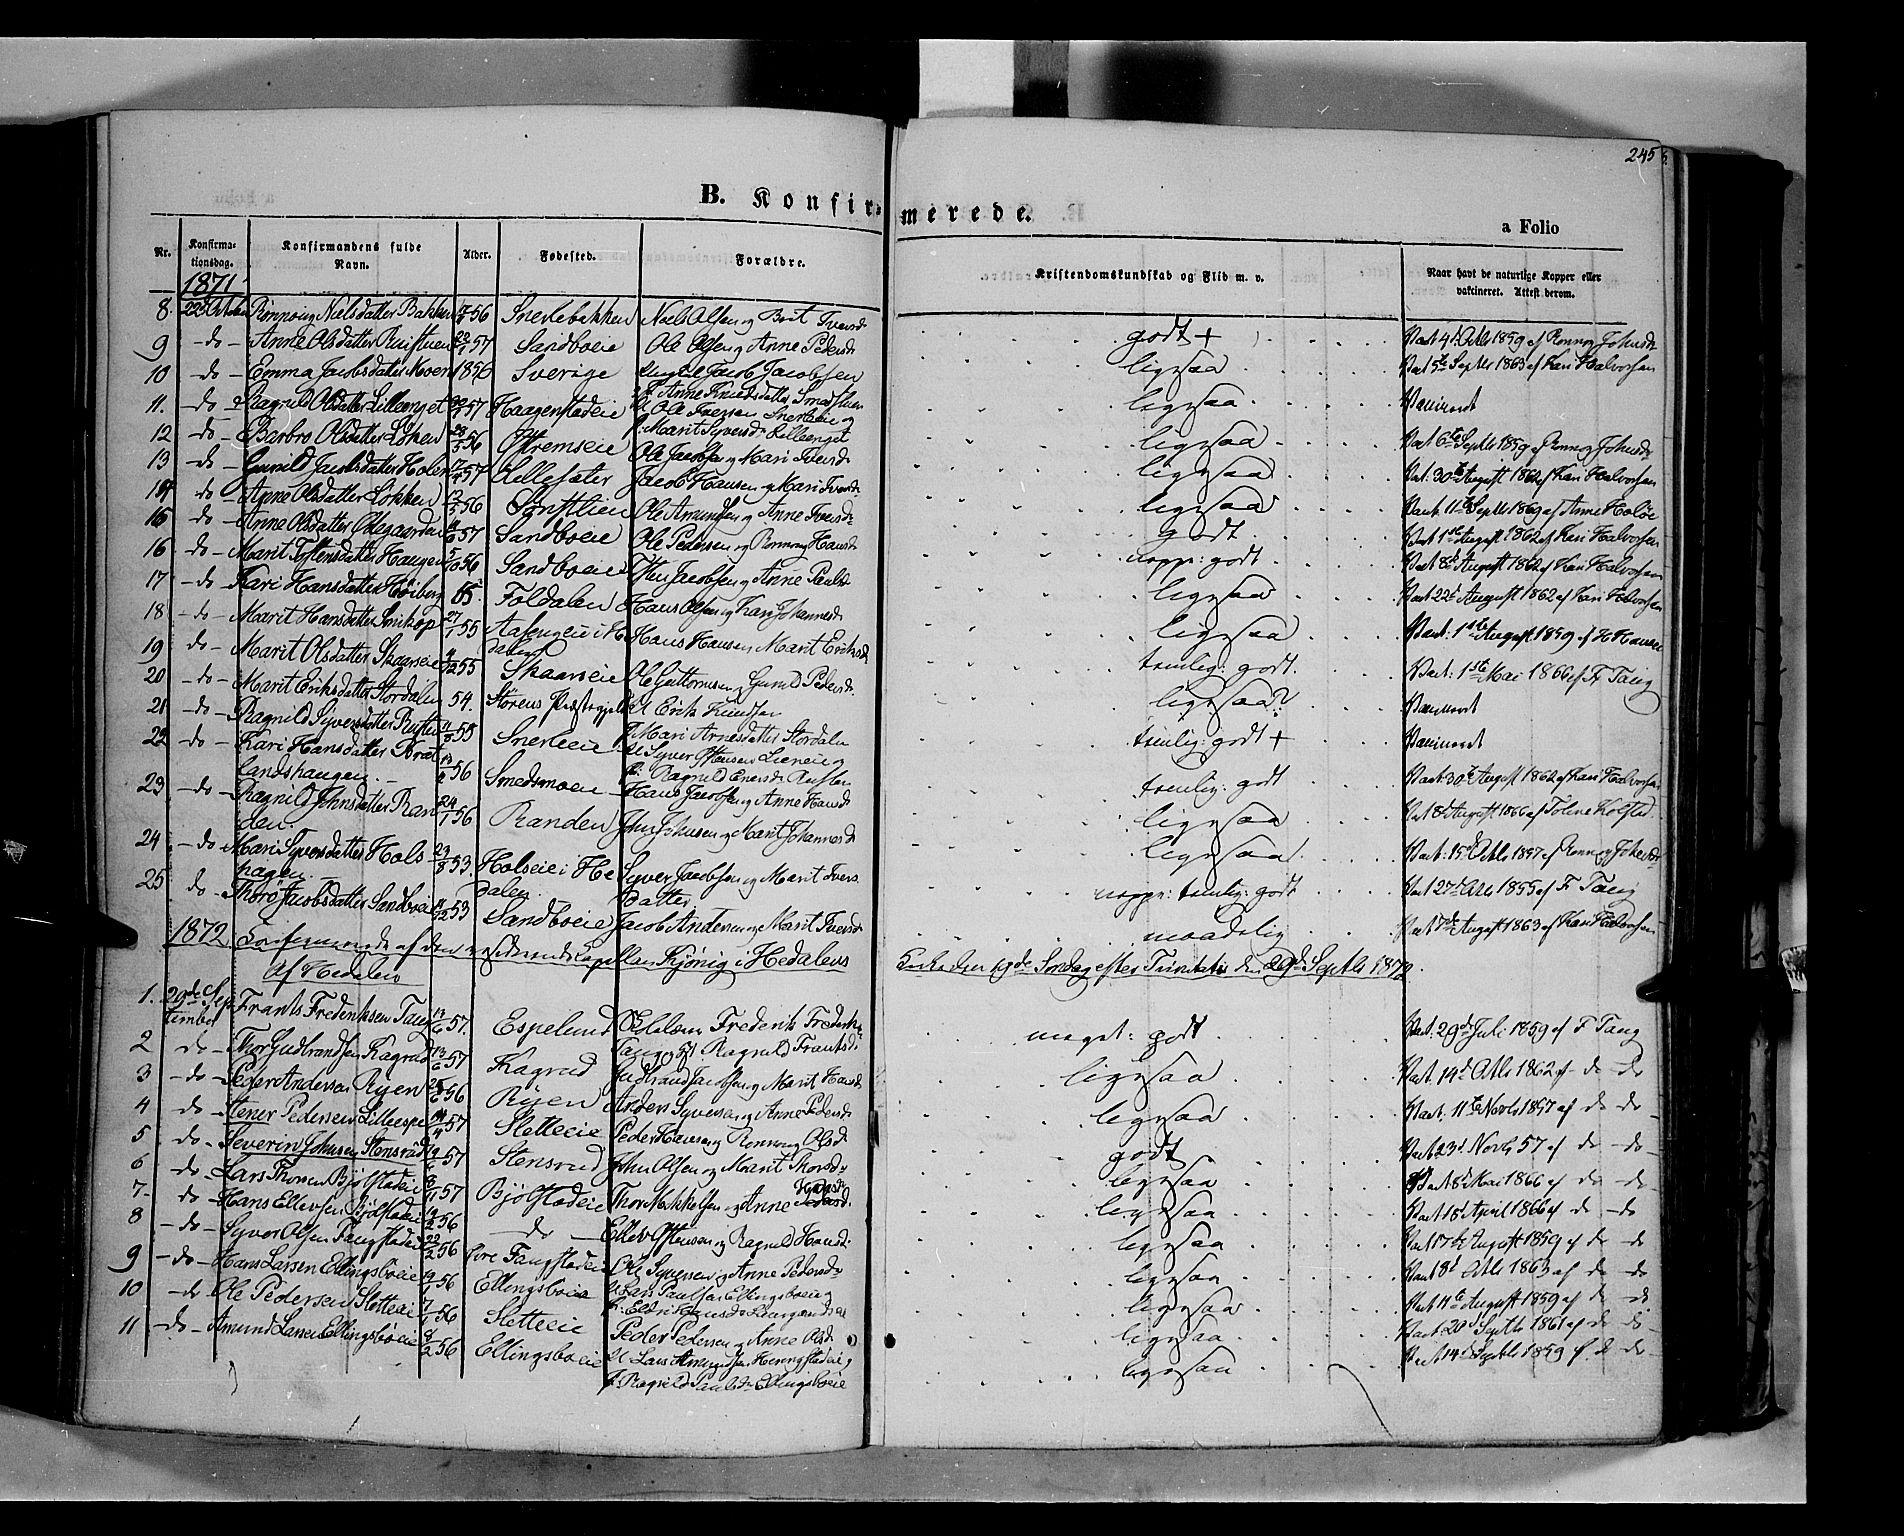 SAH, Vågå prestekontor, Ministerialbok nr. 6 /1, 1856-1872, s. 245